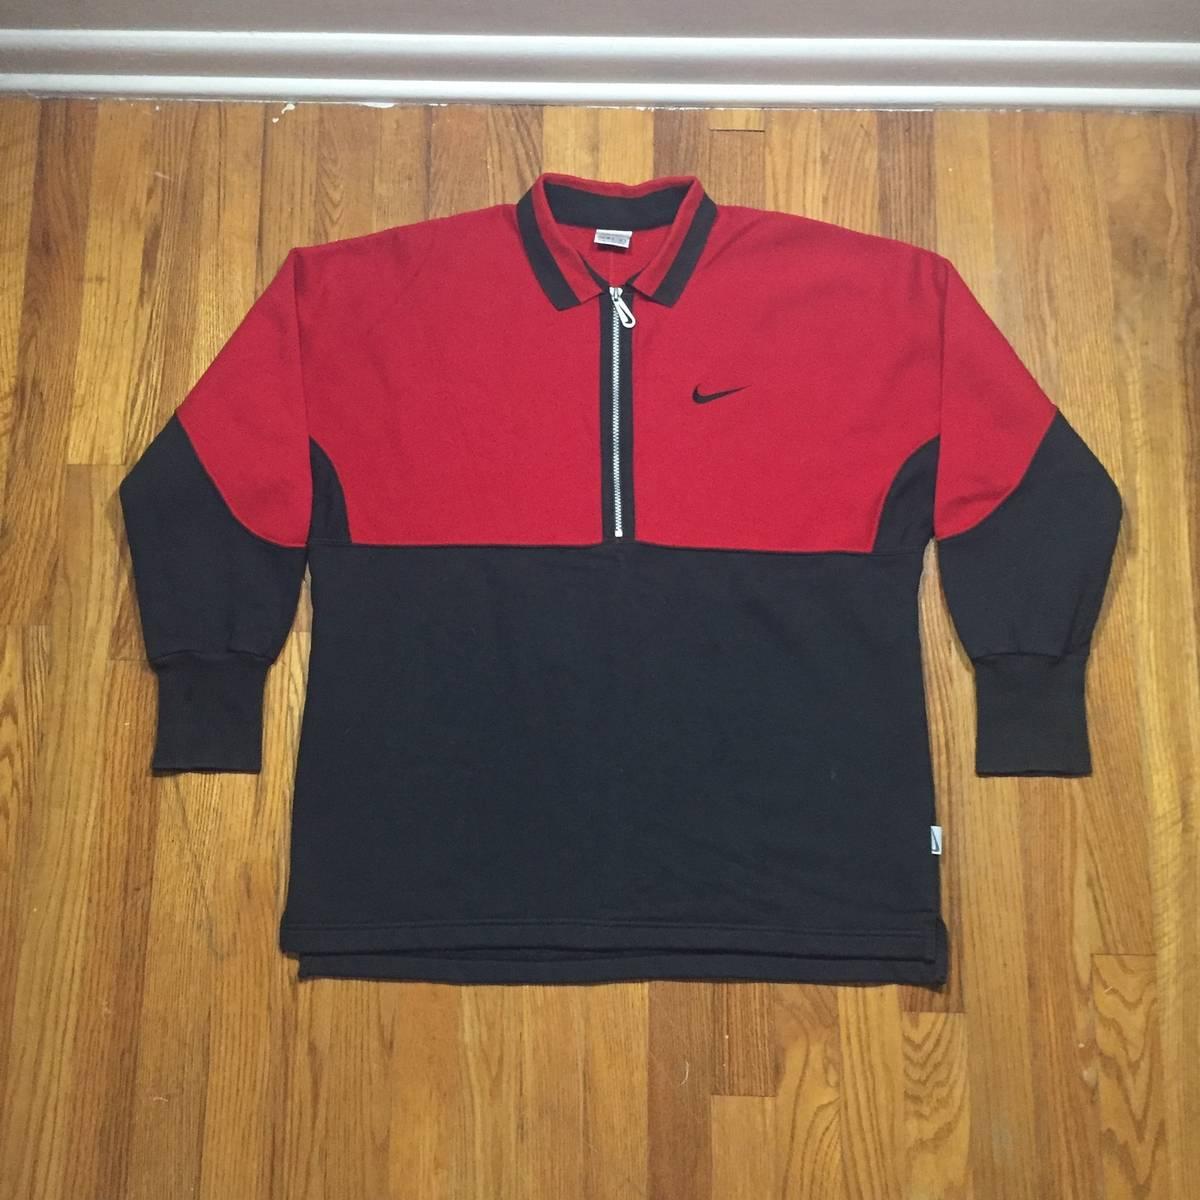 Nike Vintage Long Sleeve Zipper Polo Shirt Size M Polos For Sale